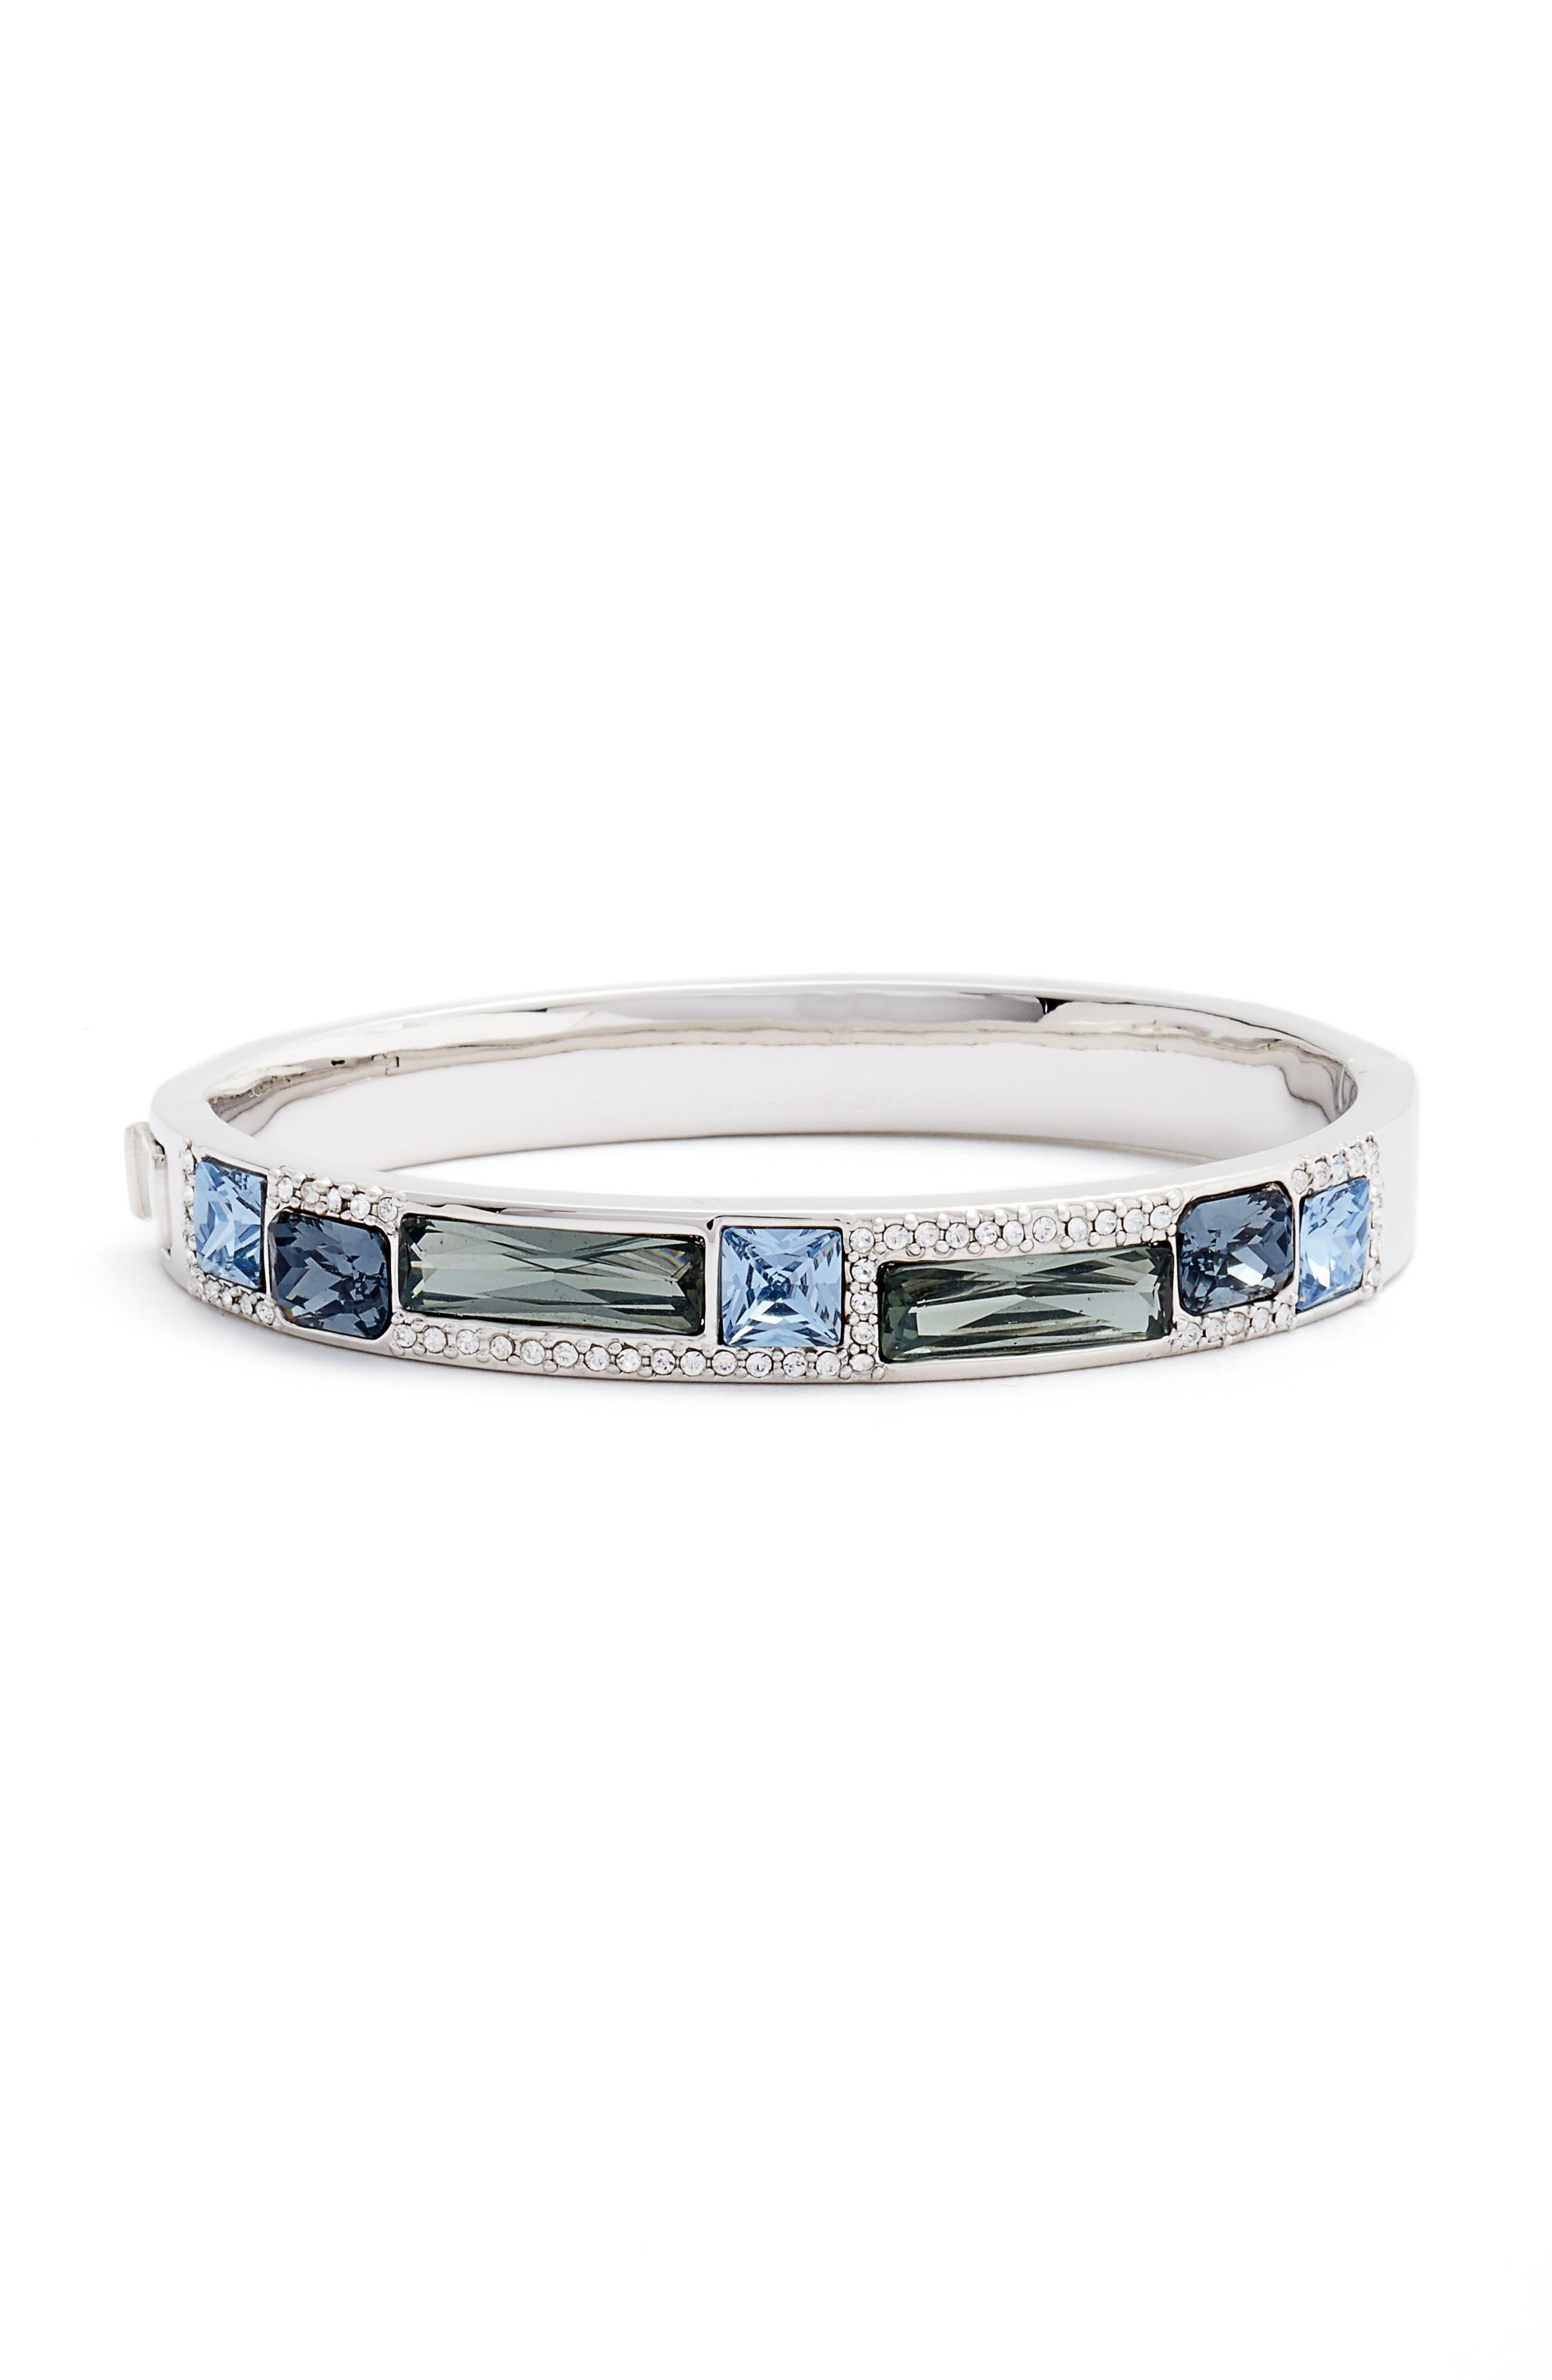 Hinge Bangle Bracelet,                         Main,                         color, Silver/ Blue Multi